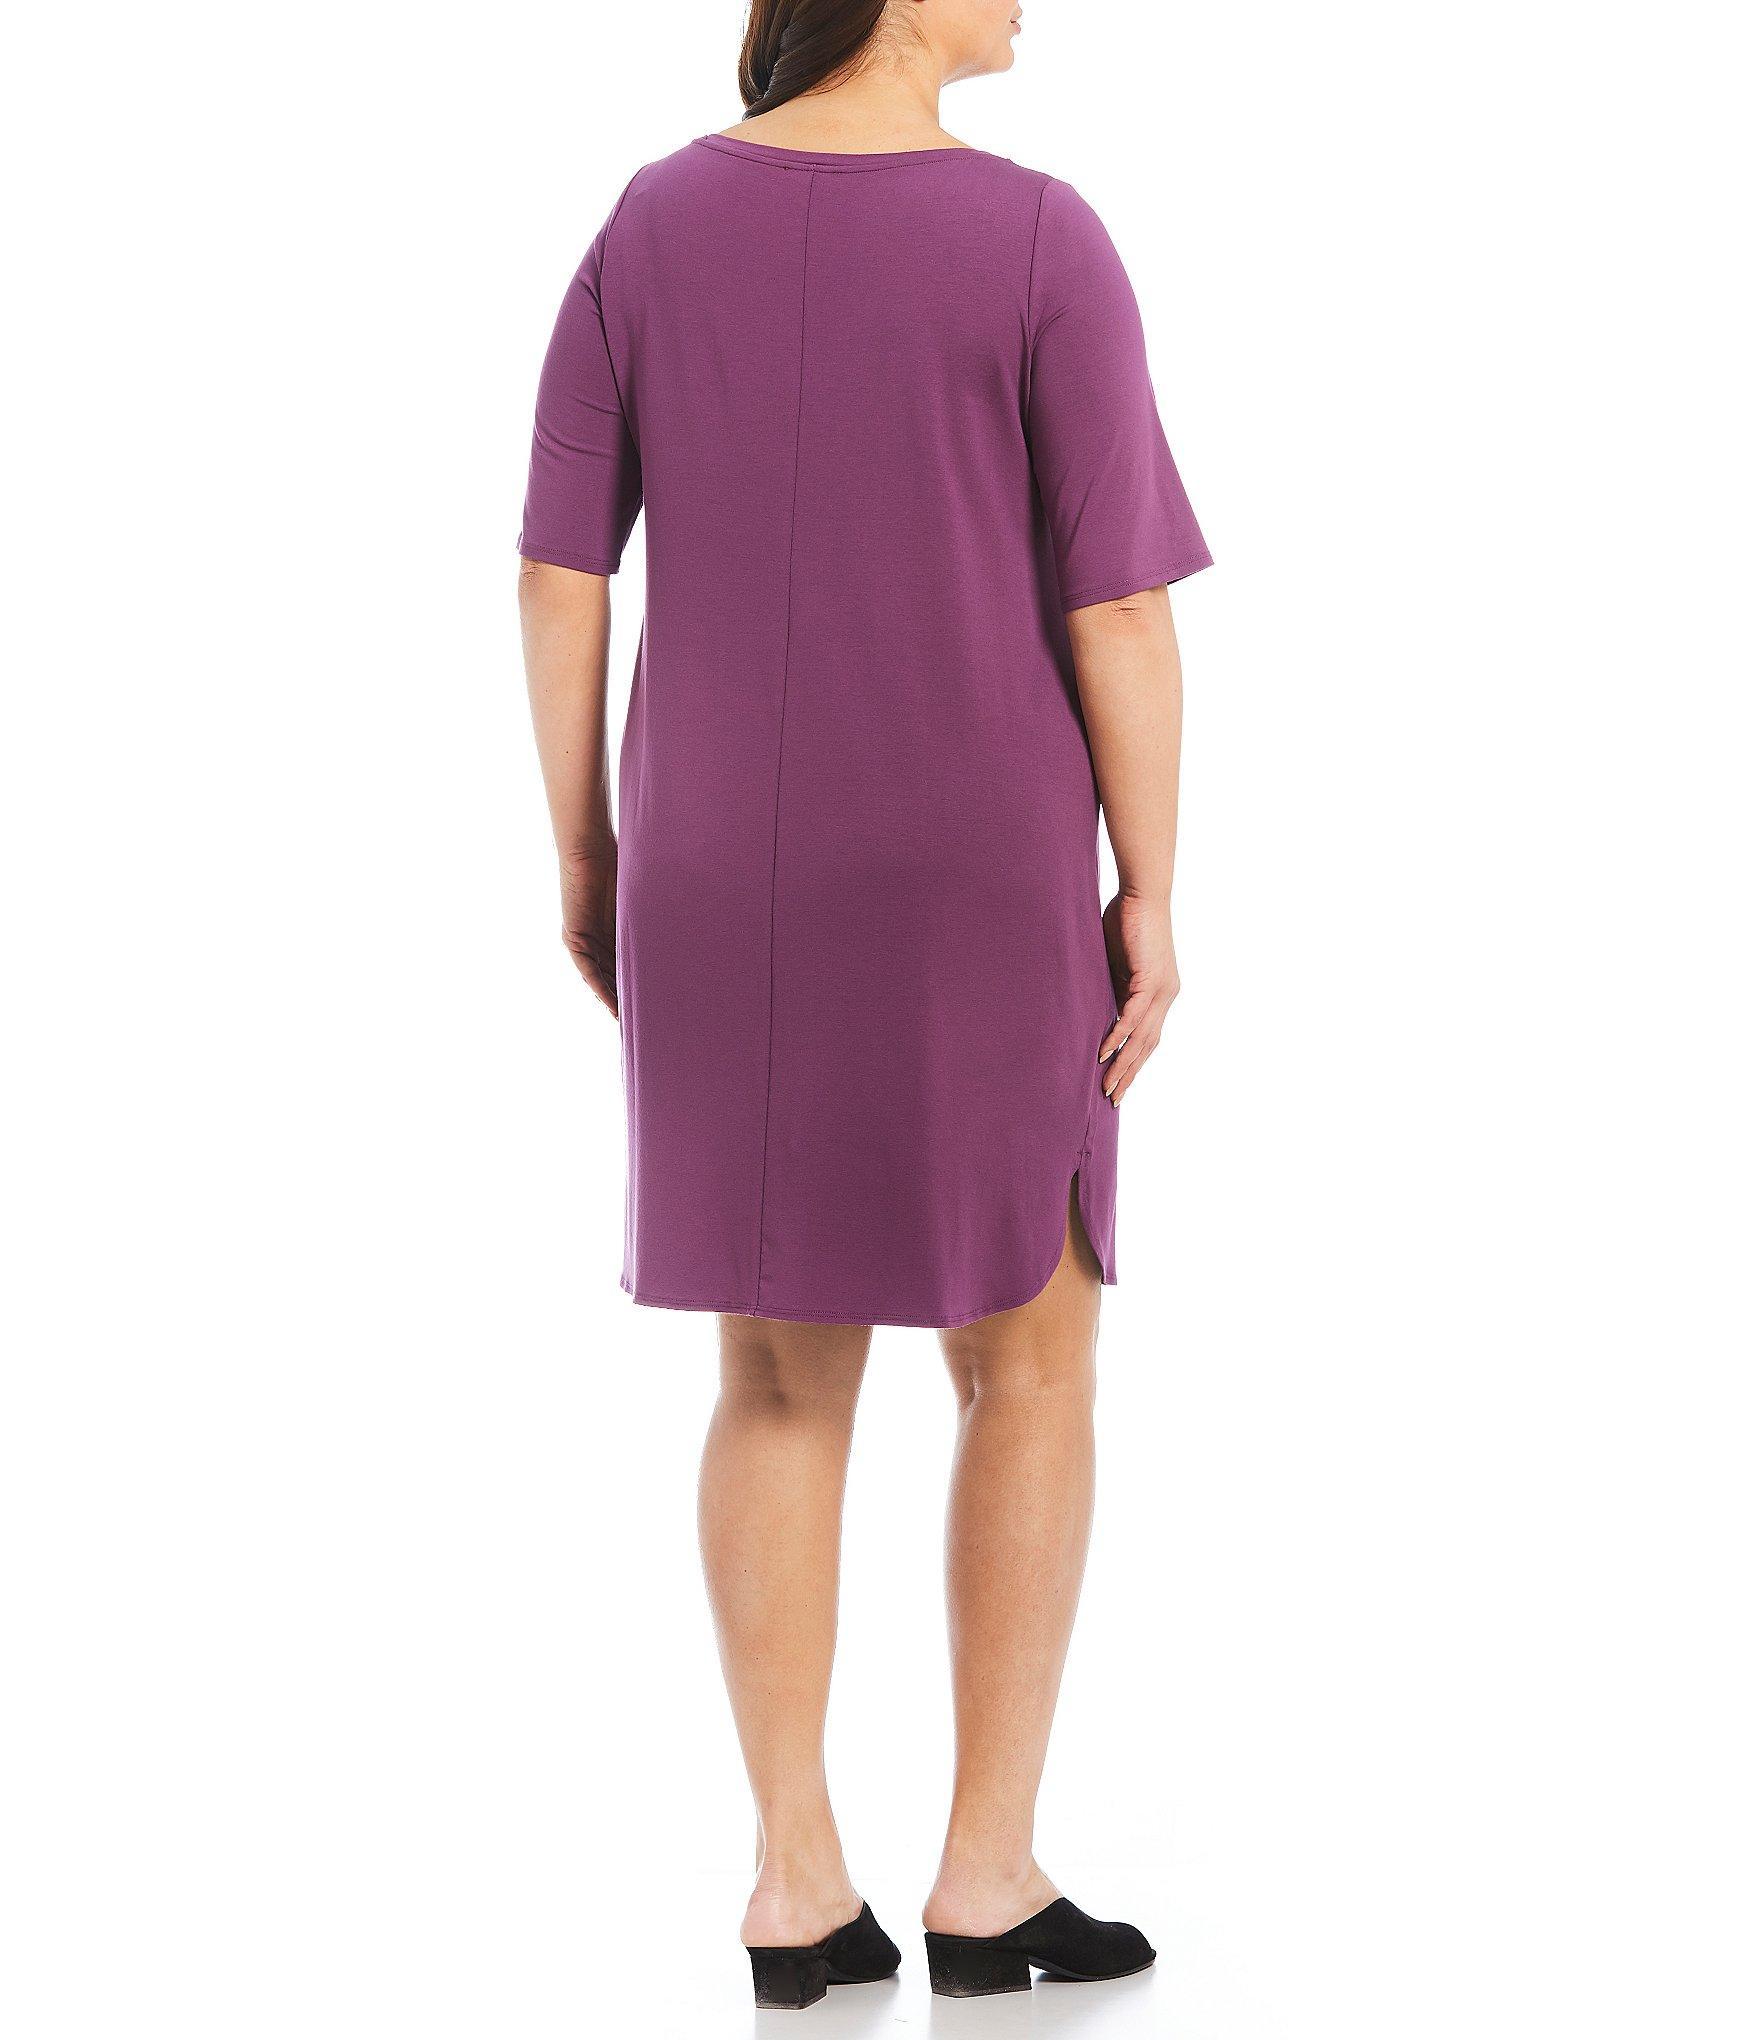 5bc13e0065e Eileen Fisher - Purple Plus Size Bateau Neck Shirttail Hem Dress - Lyst.  View fullscreen